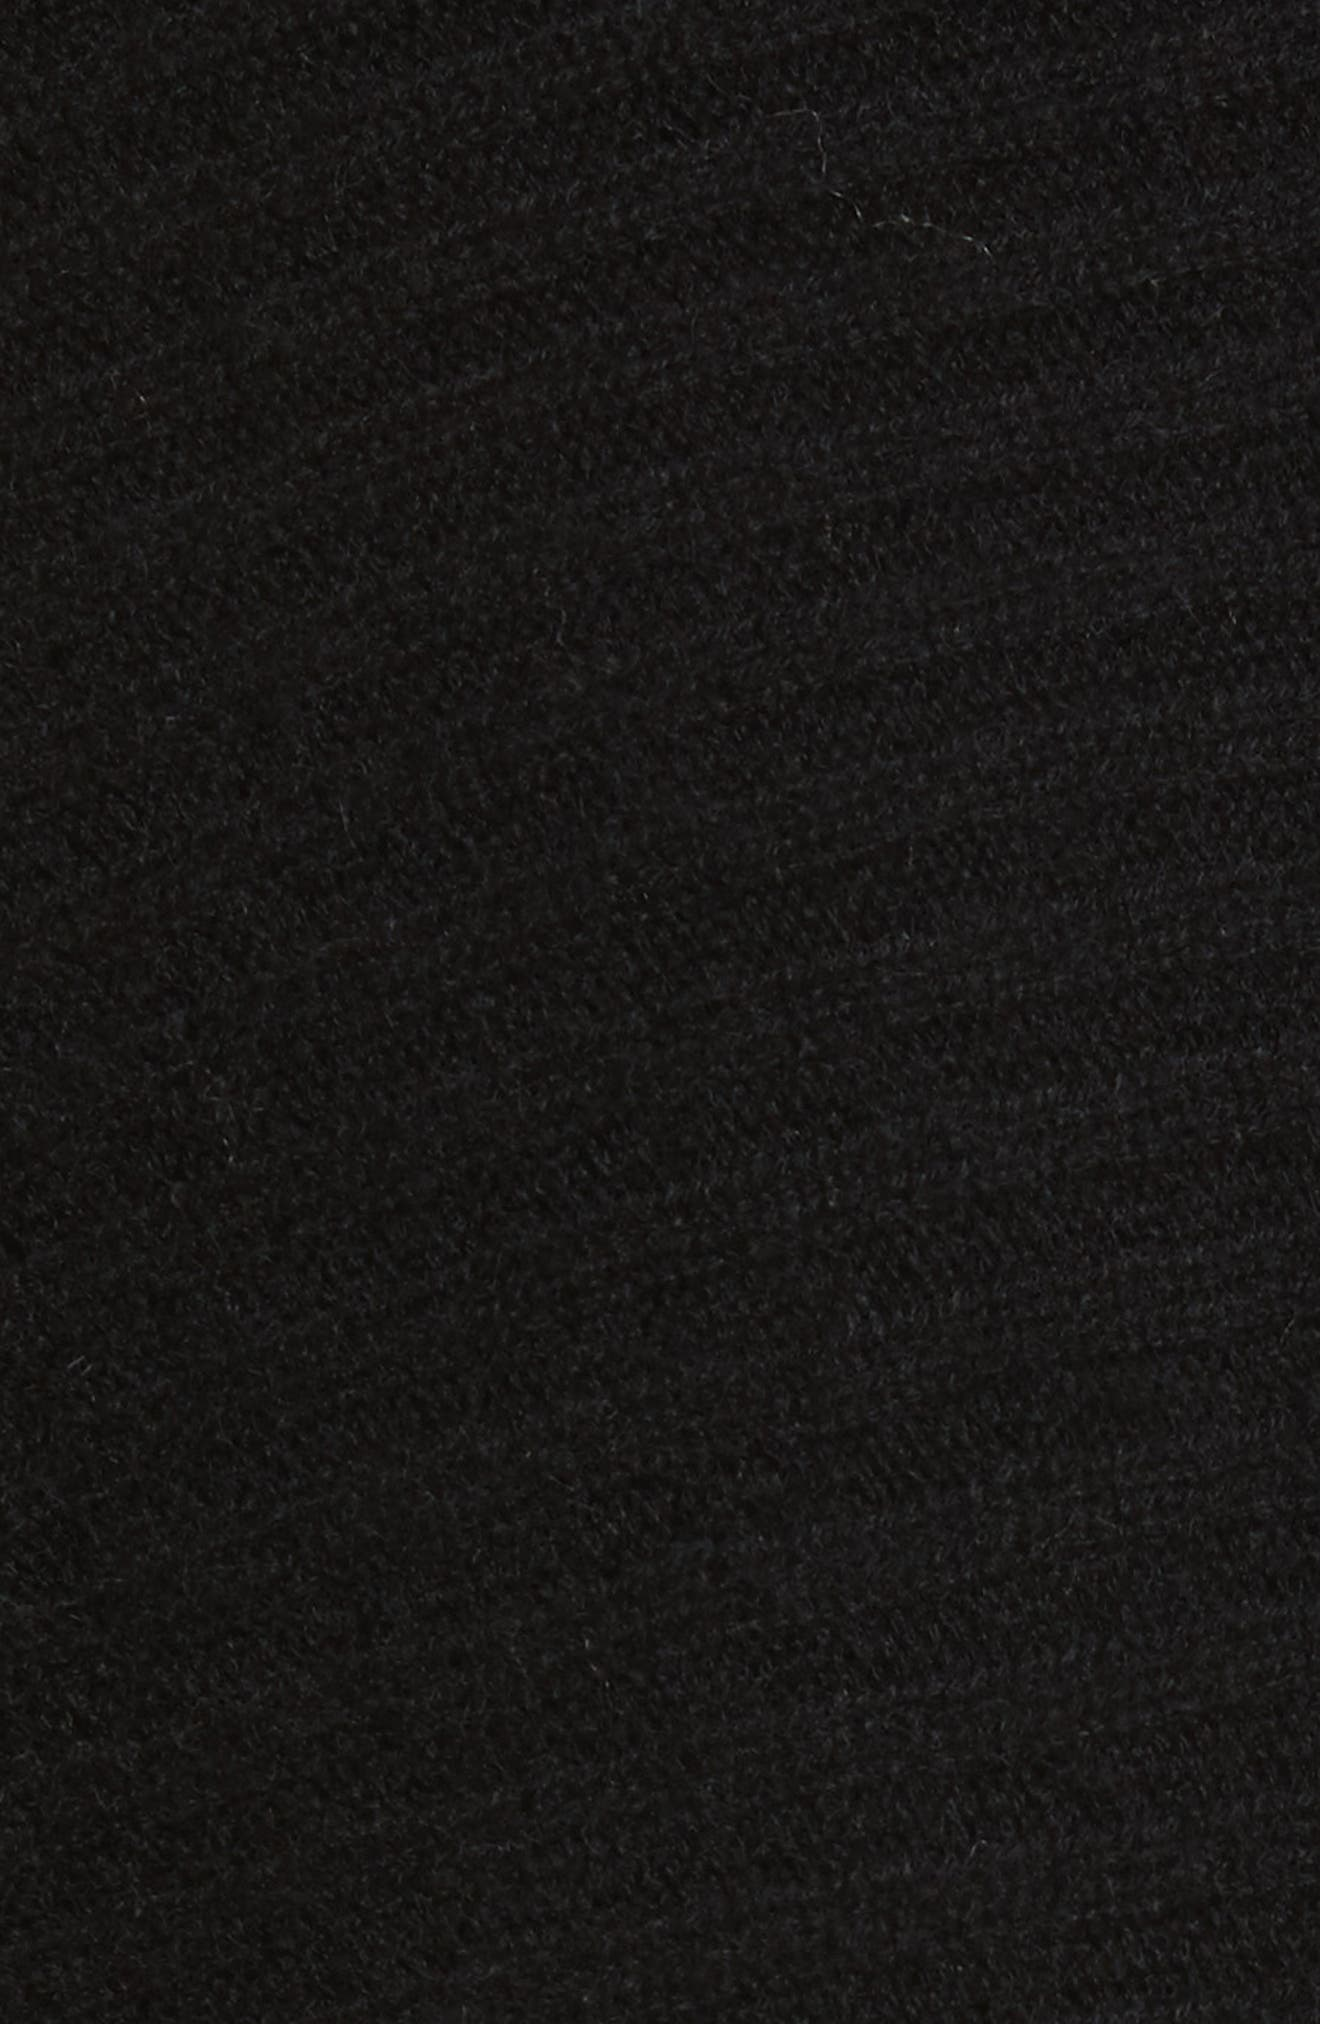 Wool Blend Raglan V-Neck Sweater,                             Alternate thumbnail 5, color,                             001